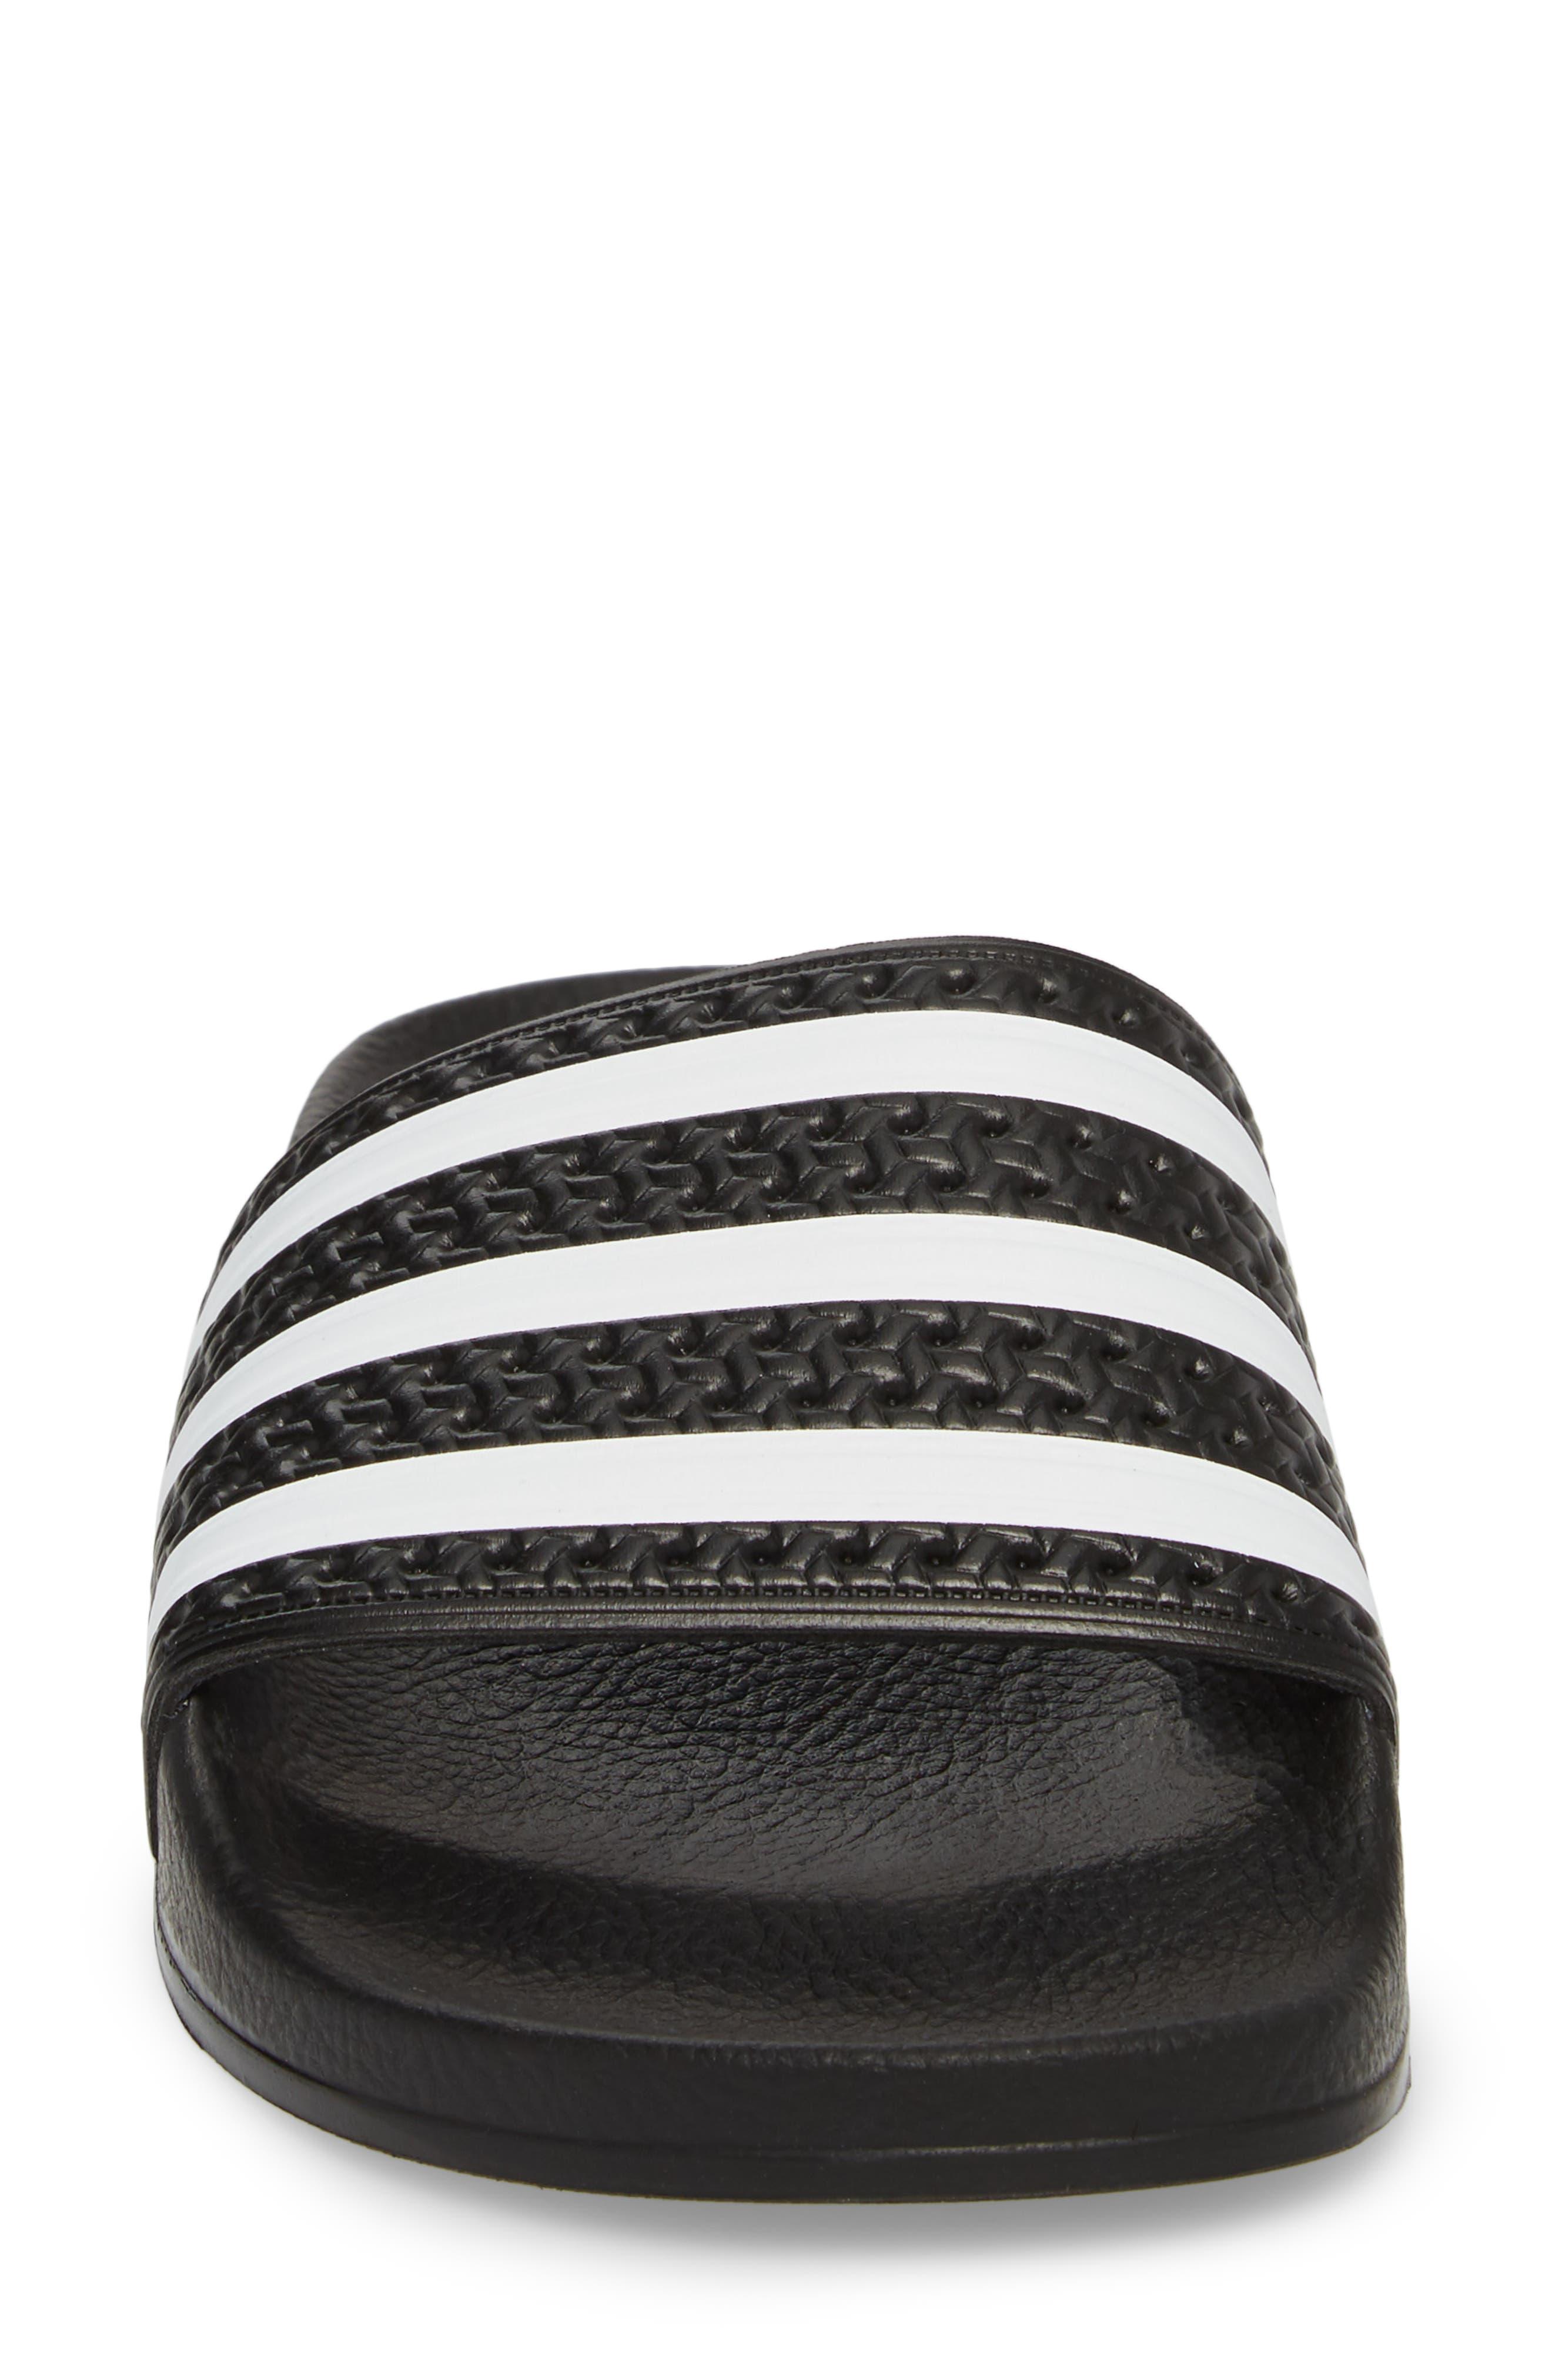 ADIDAS,                             'Adilette' Slide Sandal,                             Alternate thumbnail 4, color,                             CORE BLACK/ WHITE/ CORE BLACK